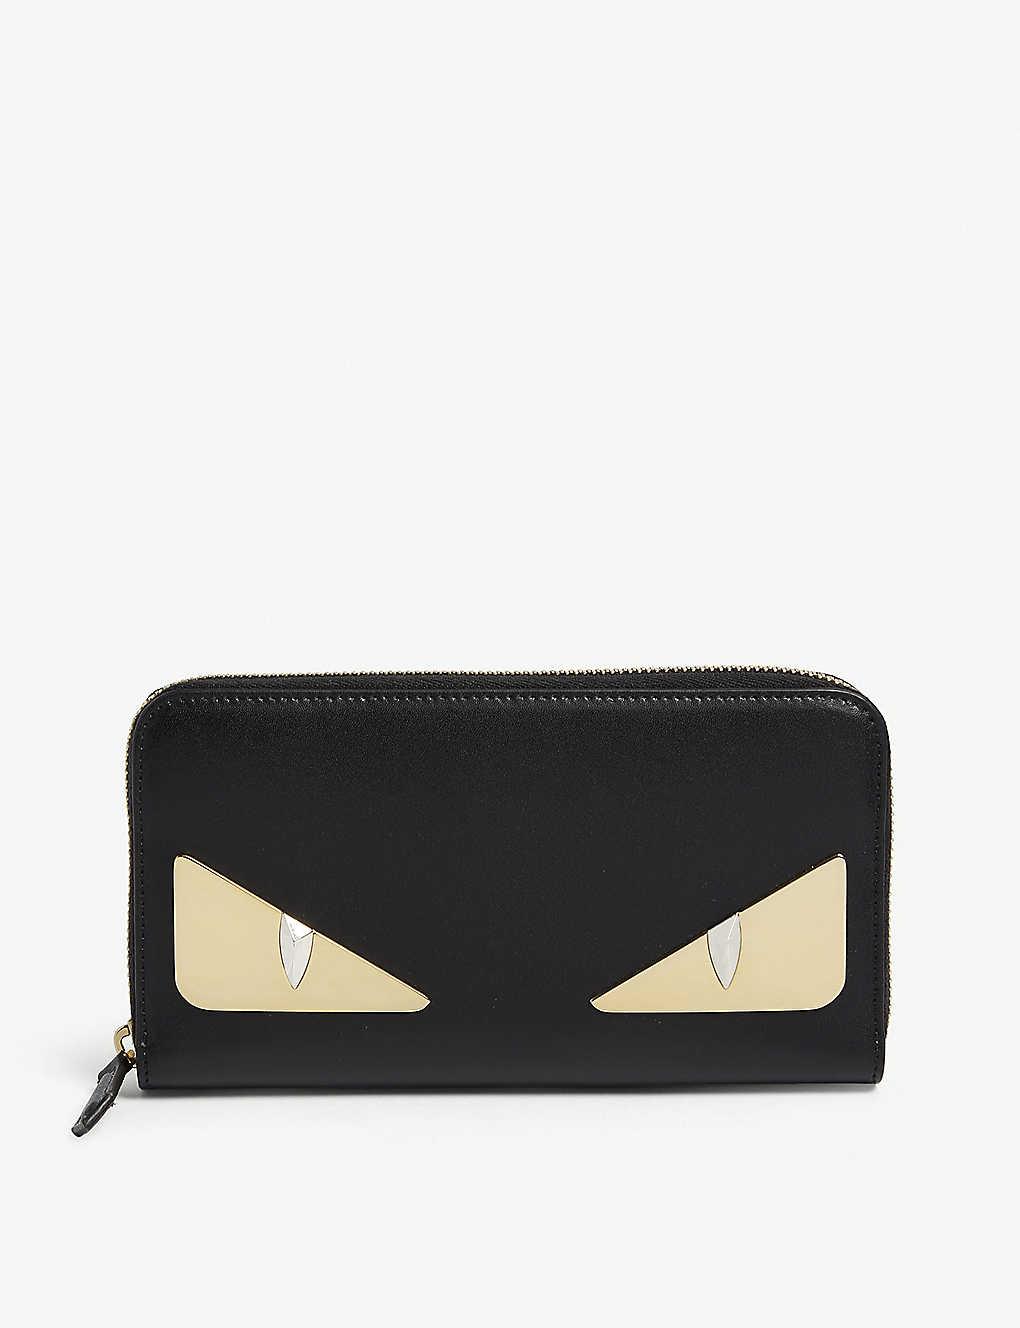 d5587ef6424f FENDI - Monster leather zip-around wallet